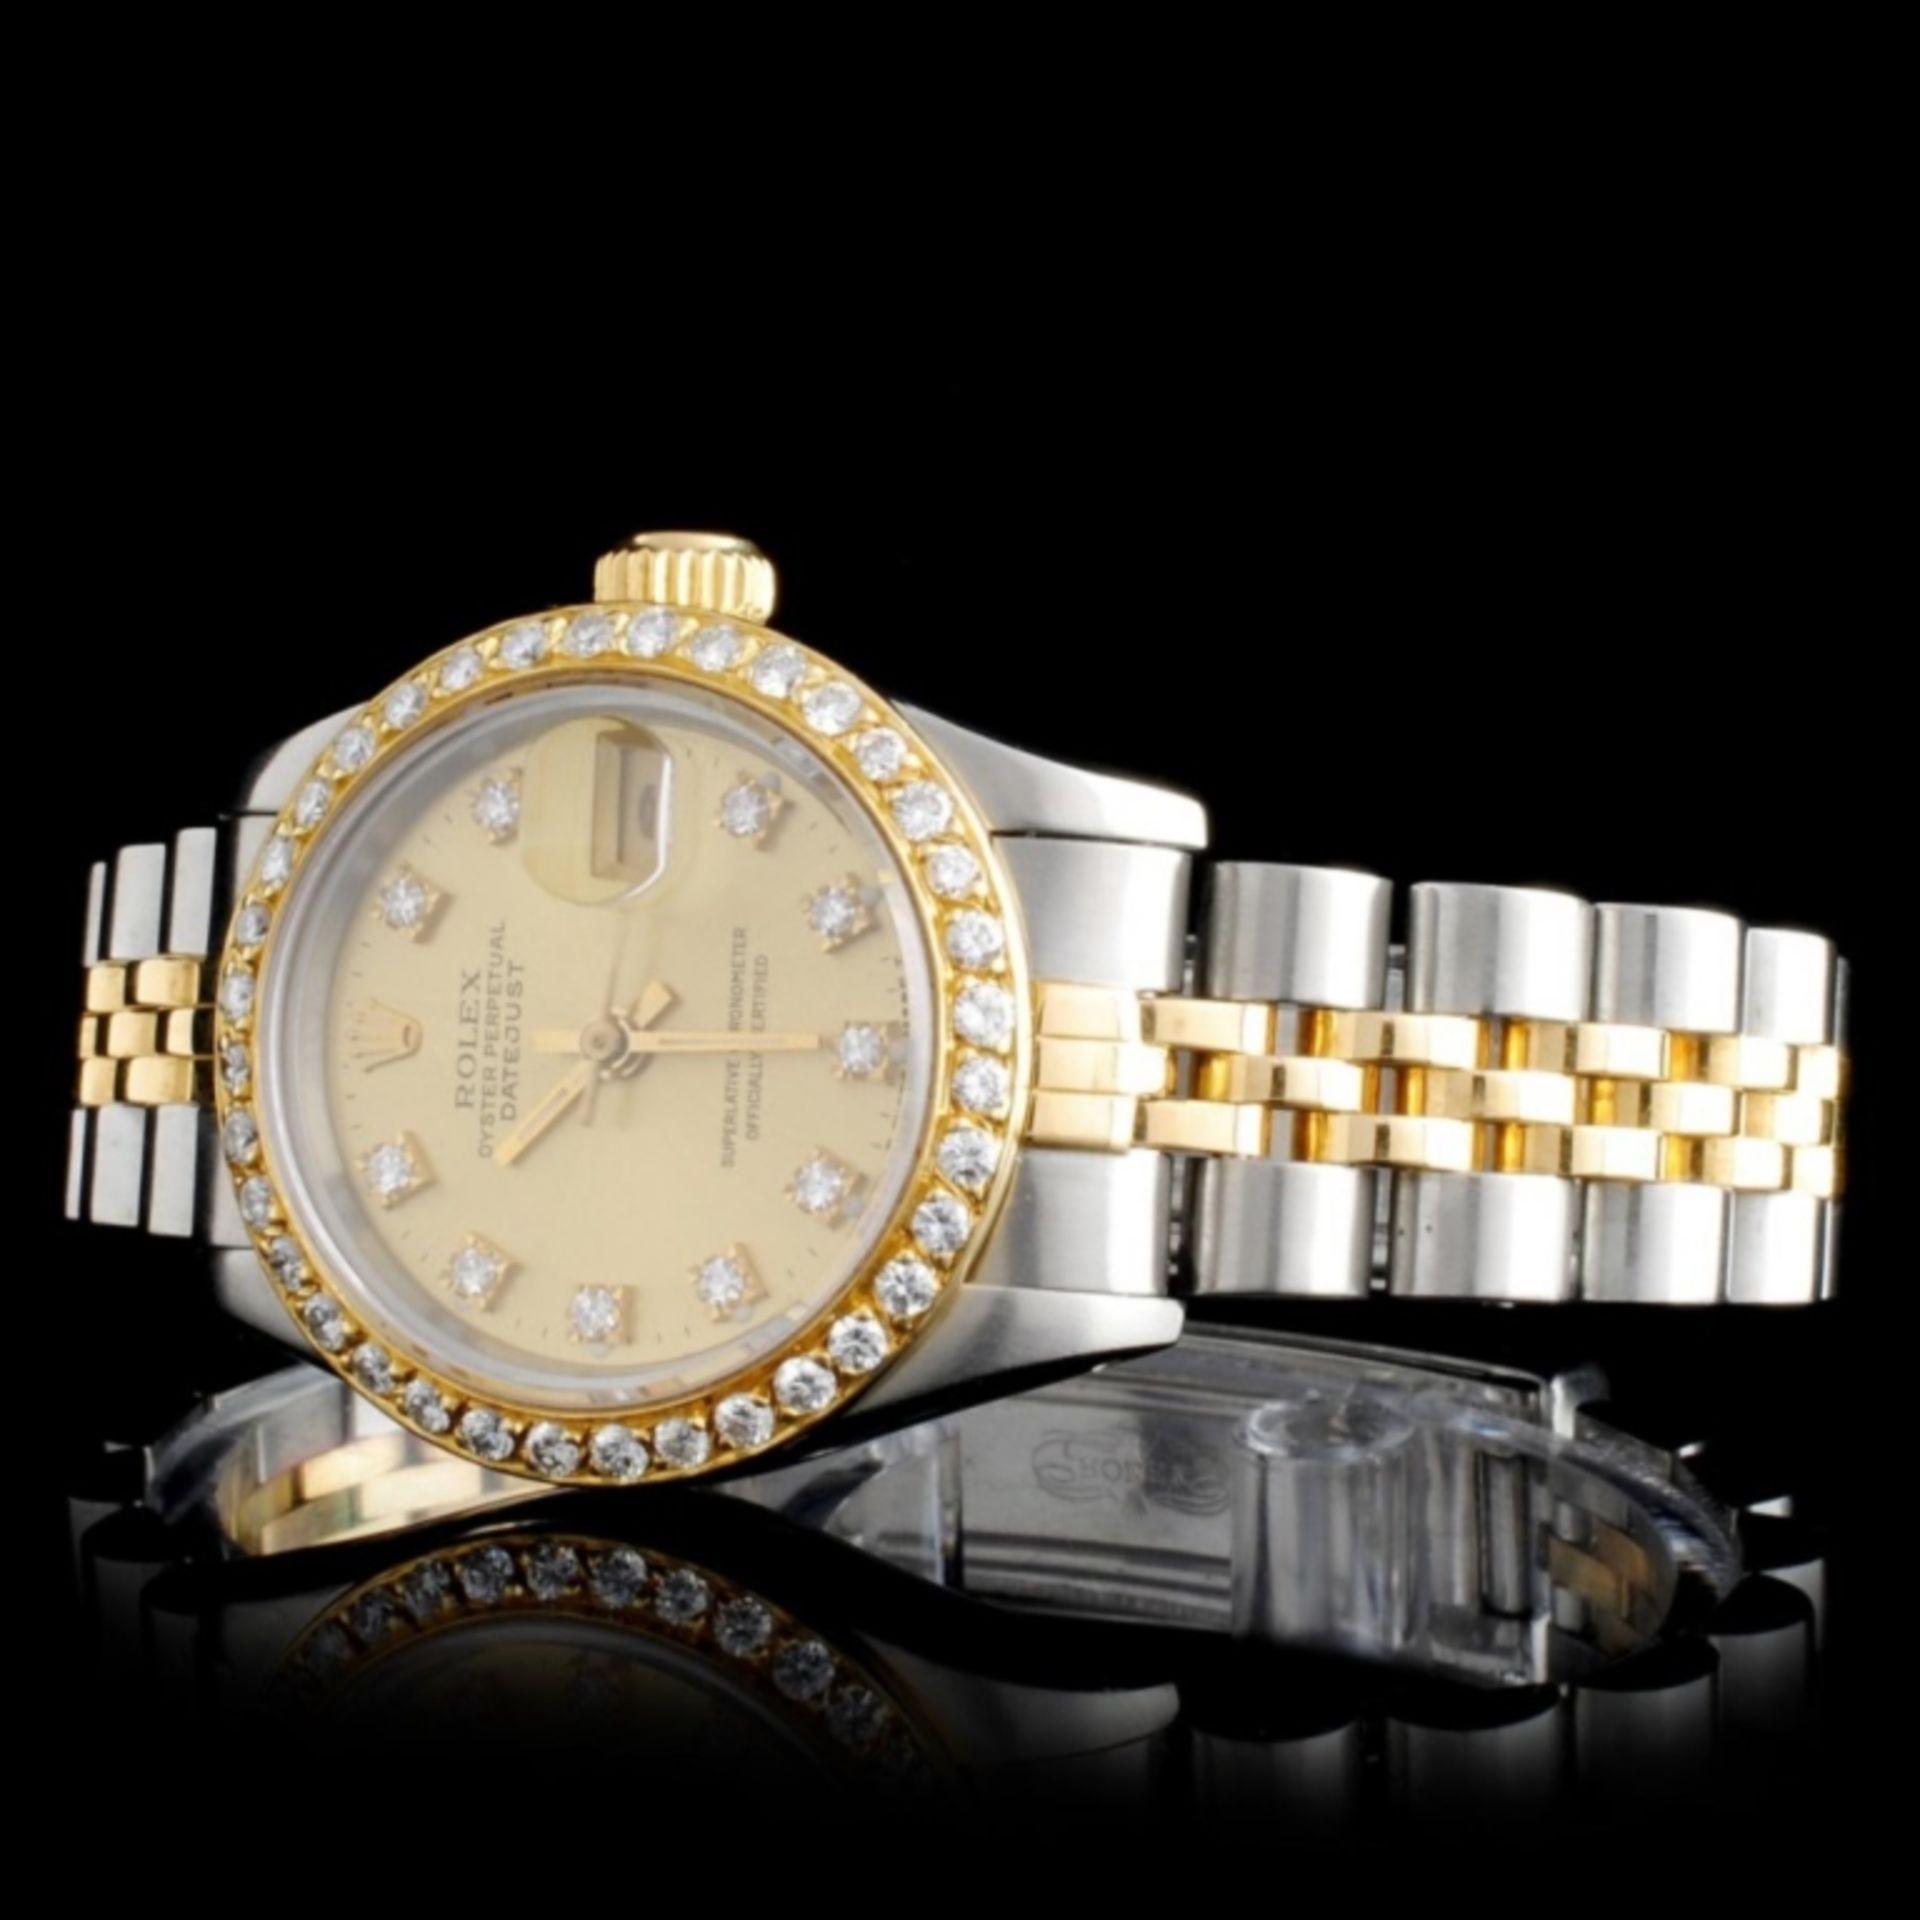 Rolex DateJust Diamond Ladies Watch - Image 2 of 5